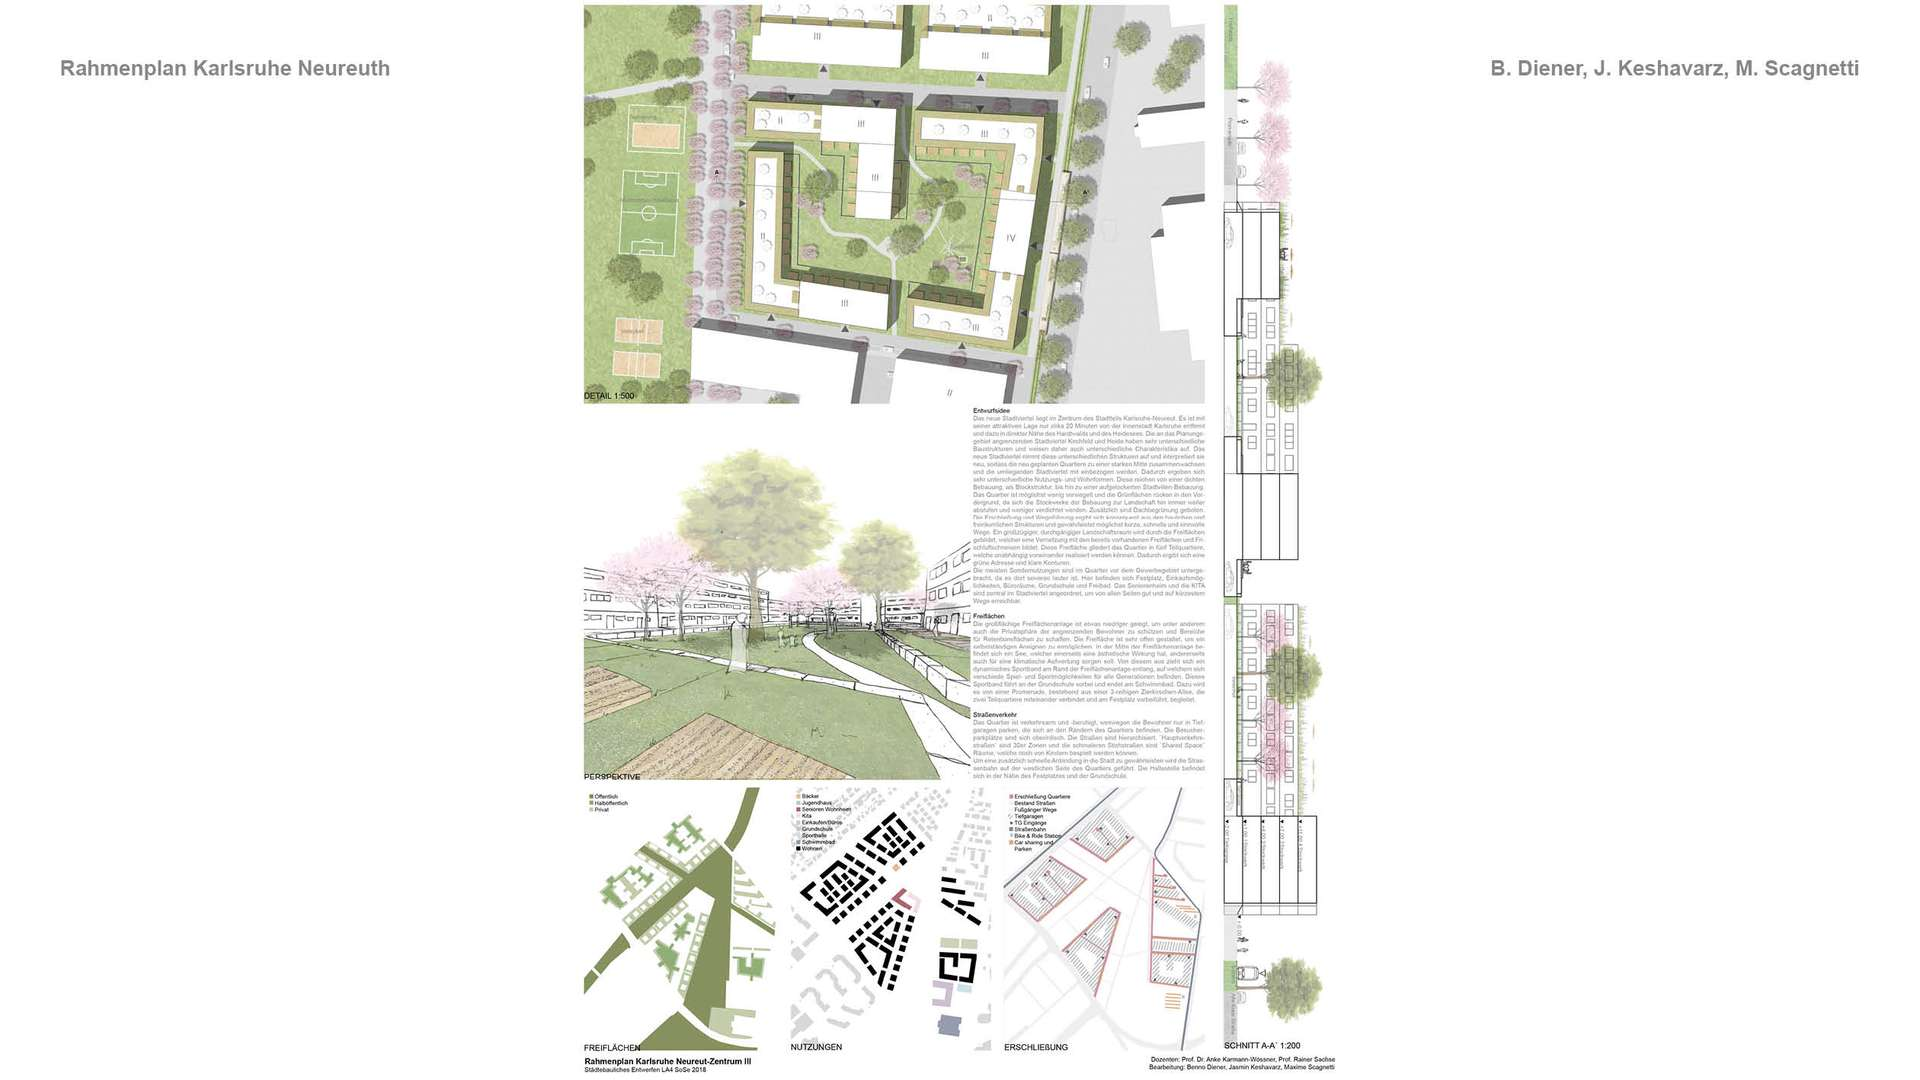 06 Rahmenkonzept Karlsruhe Neureuth